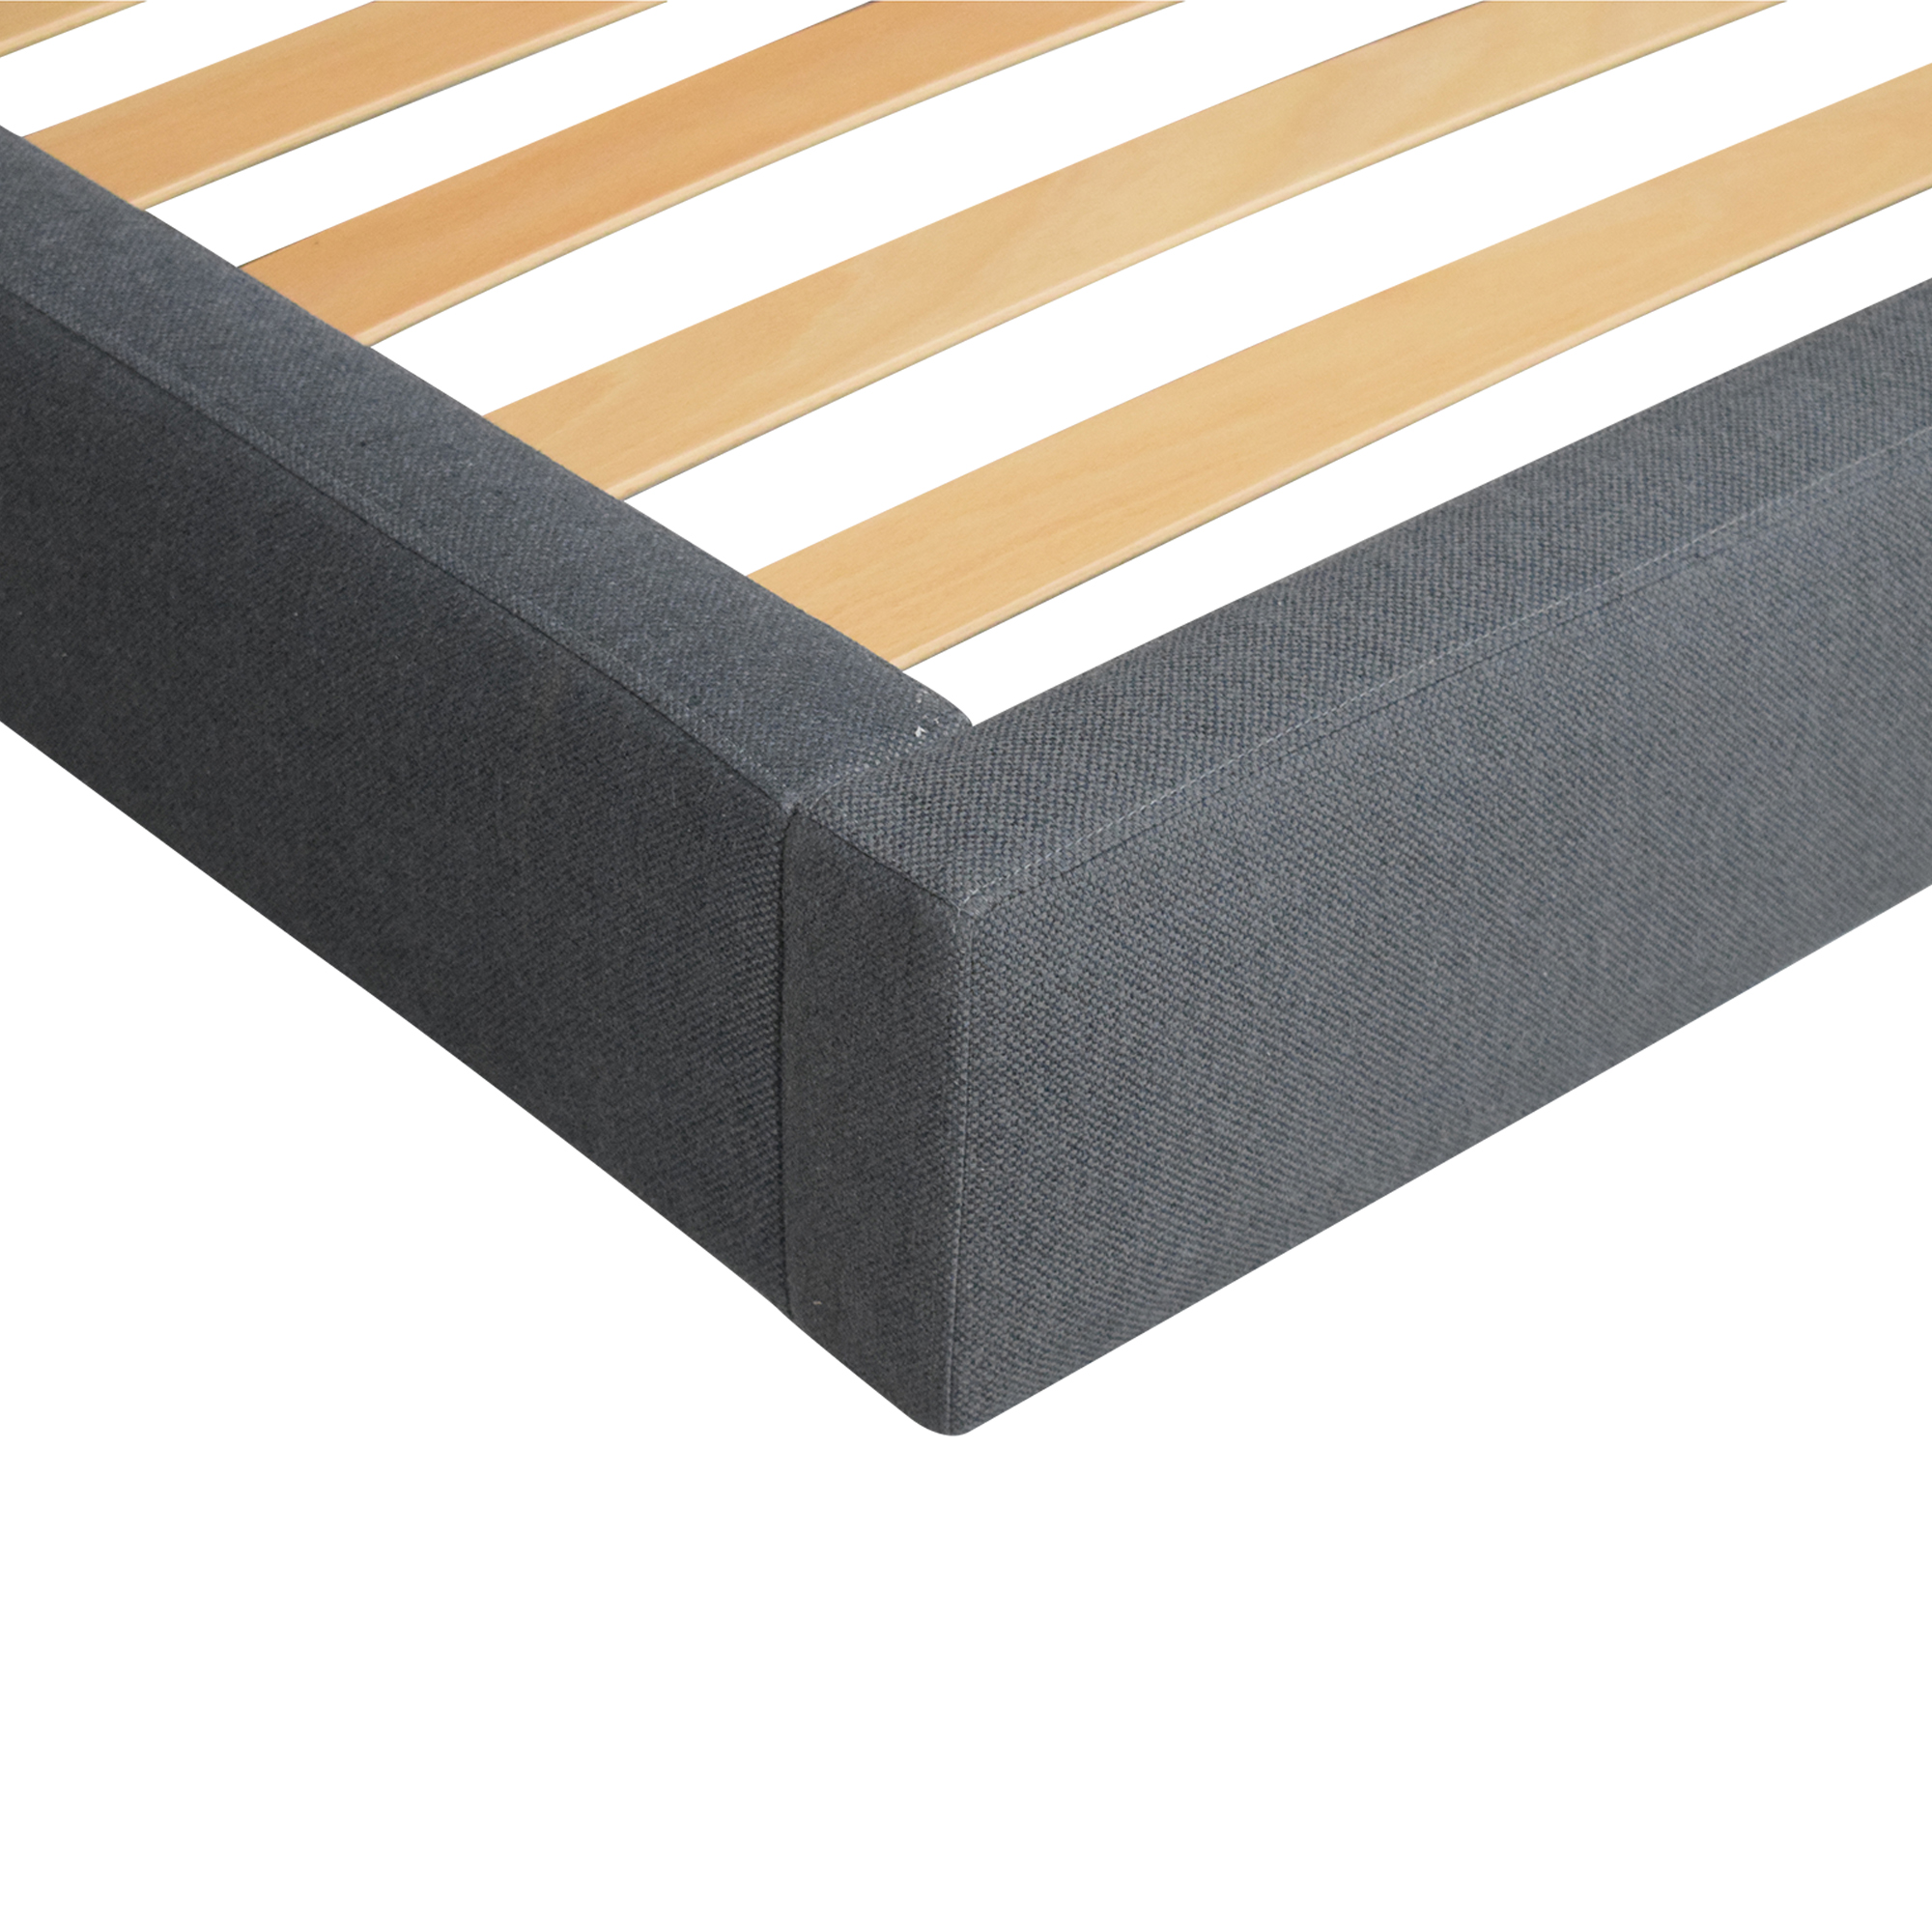 Crate & Barrel Crate & Barrel Tate Upholstered Queen Bed